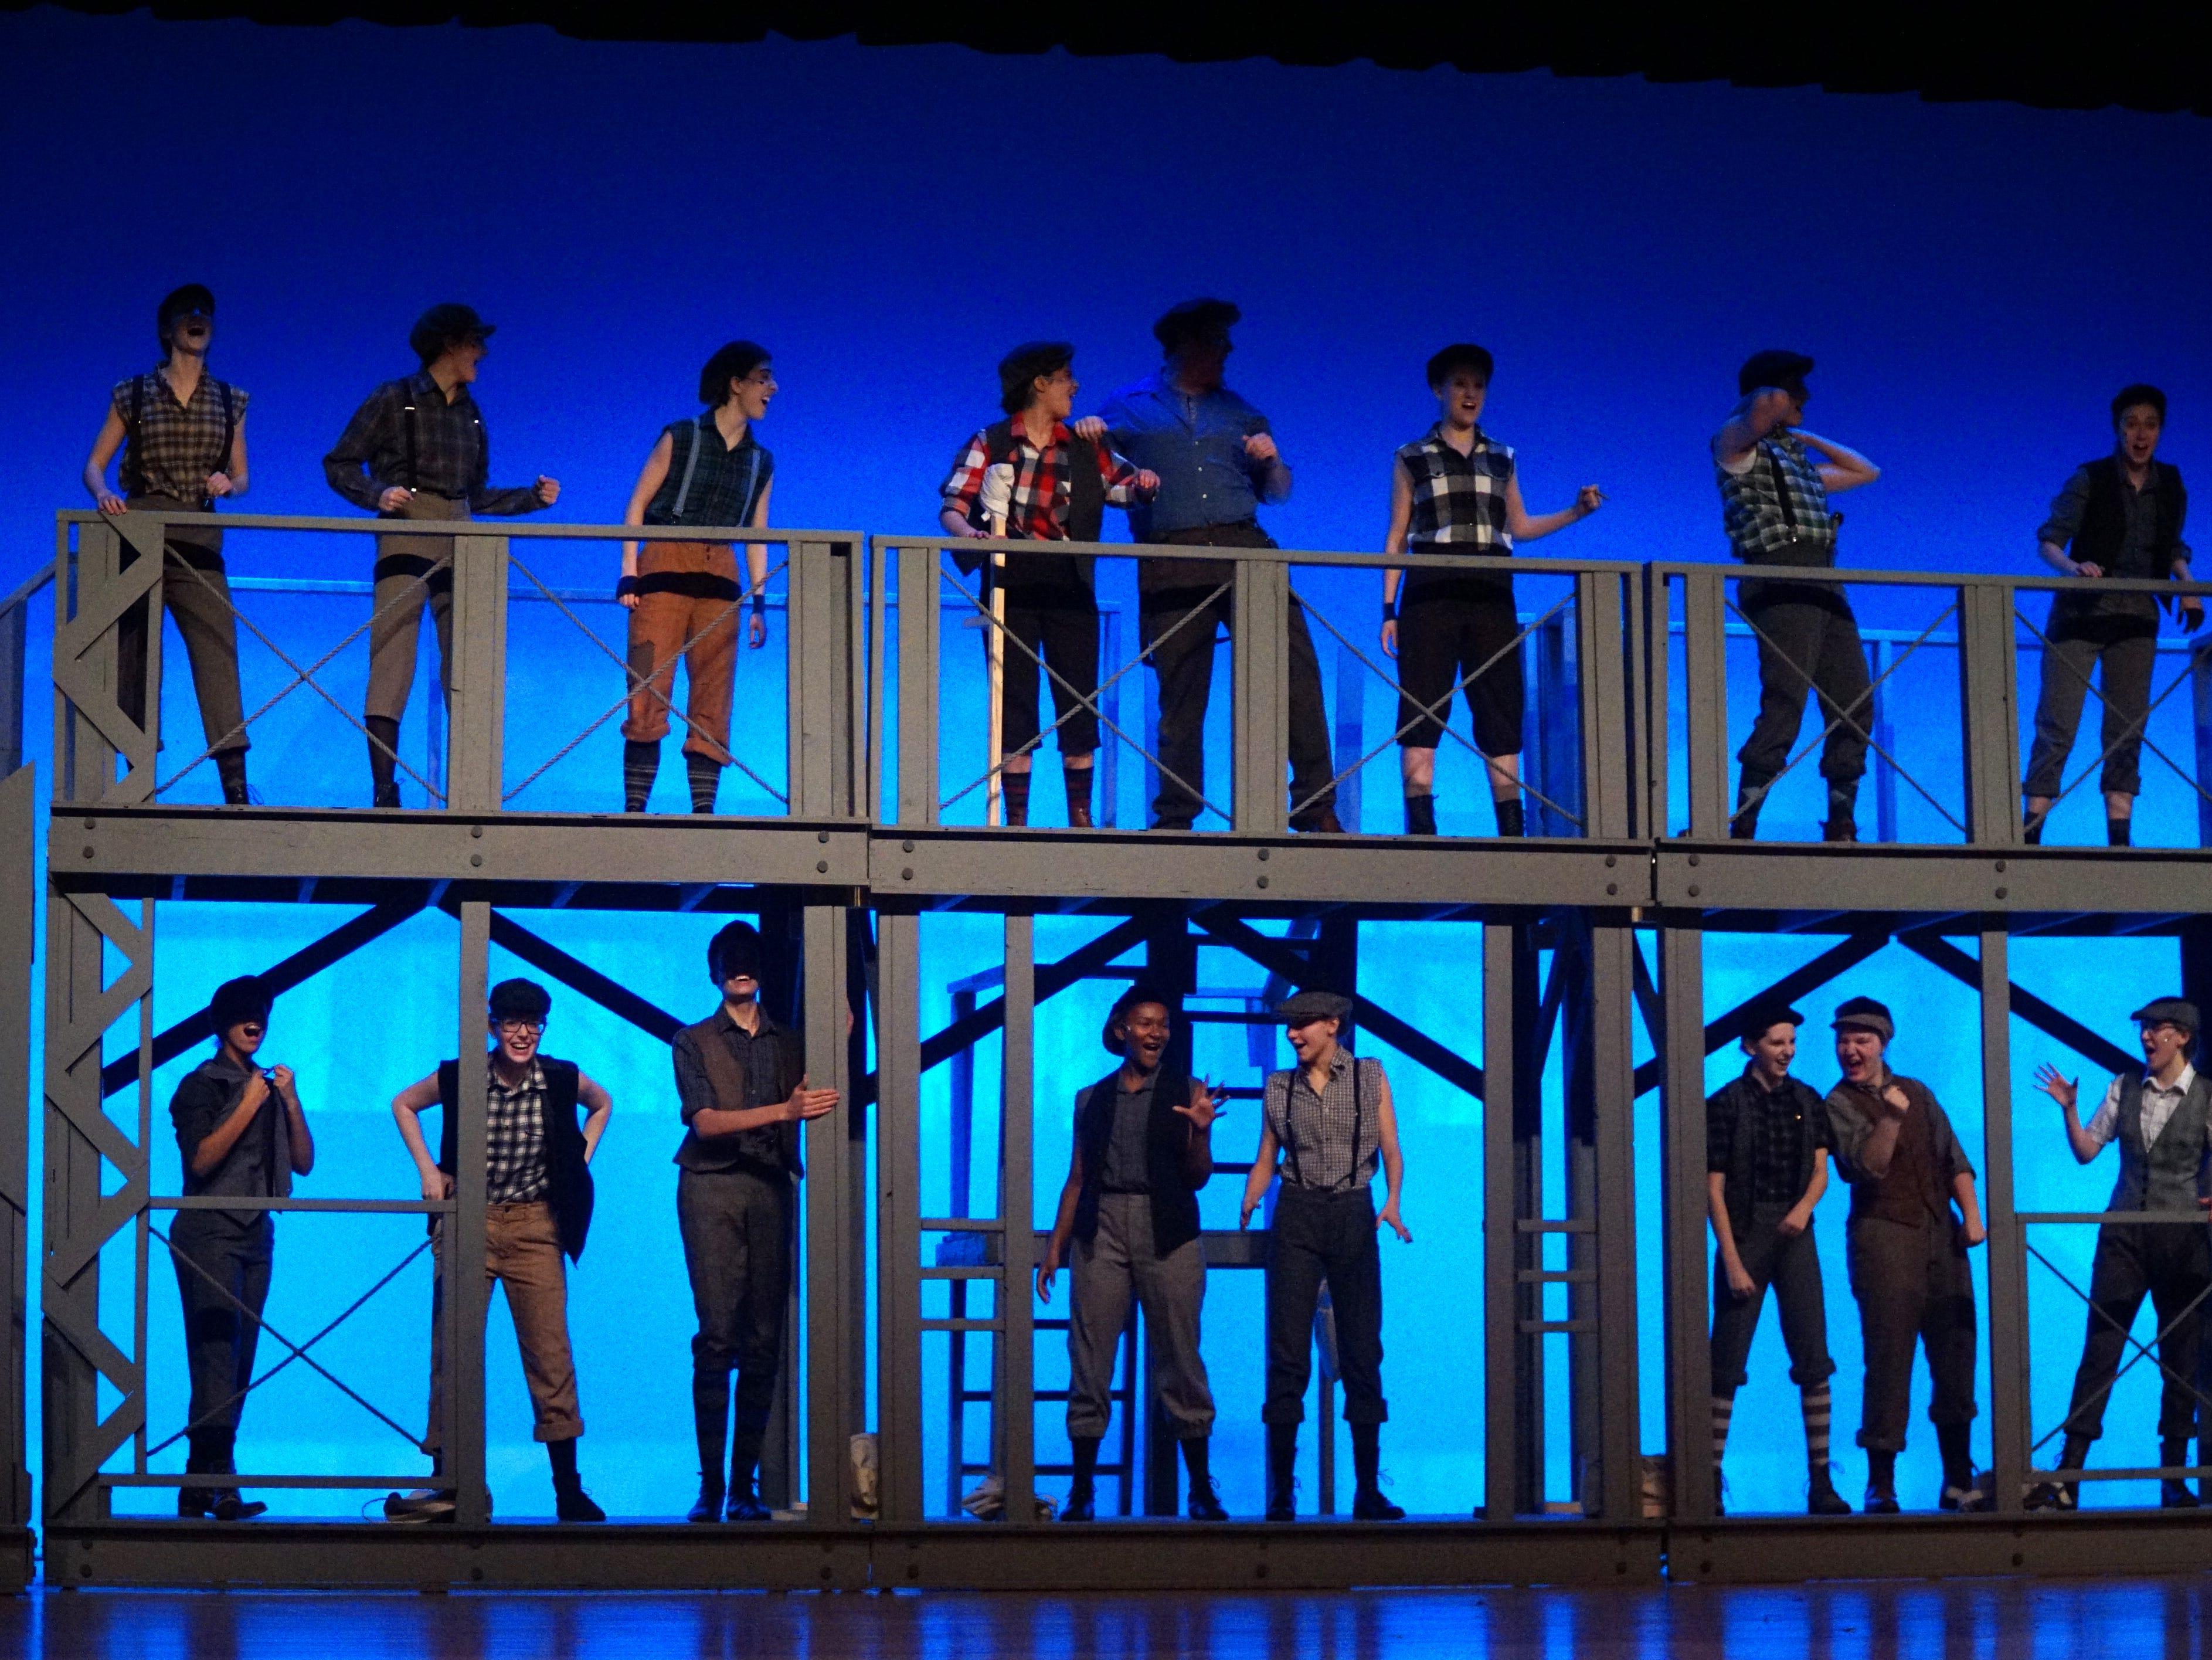 Student rehearse the musical Newsies at Mercy High in Farmington Hills on Feb. 25.